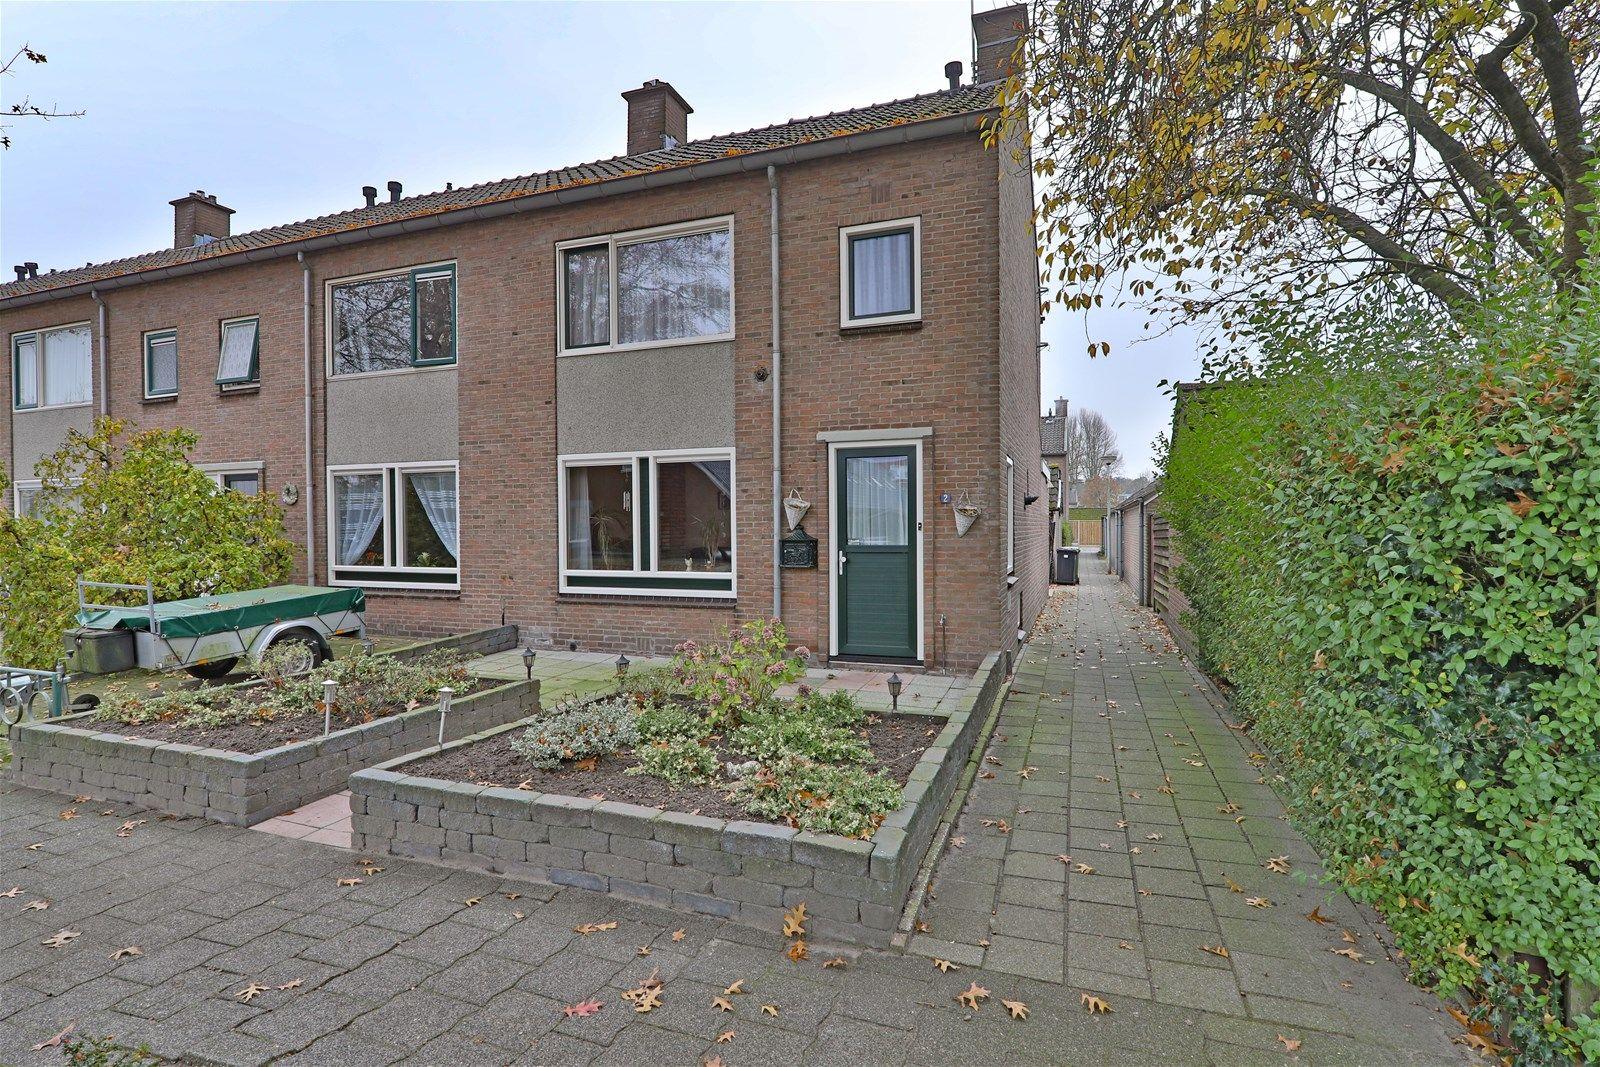 Boekenberghstraat 2, Hoogeveen